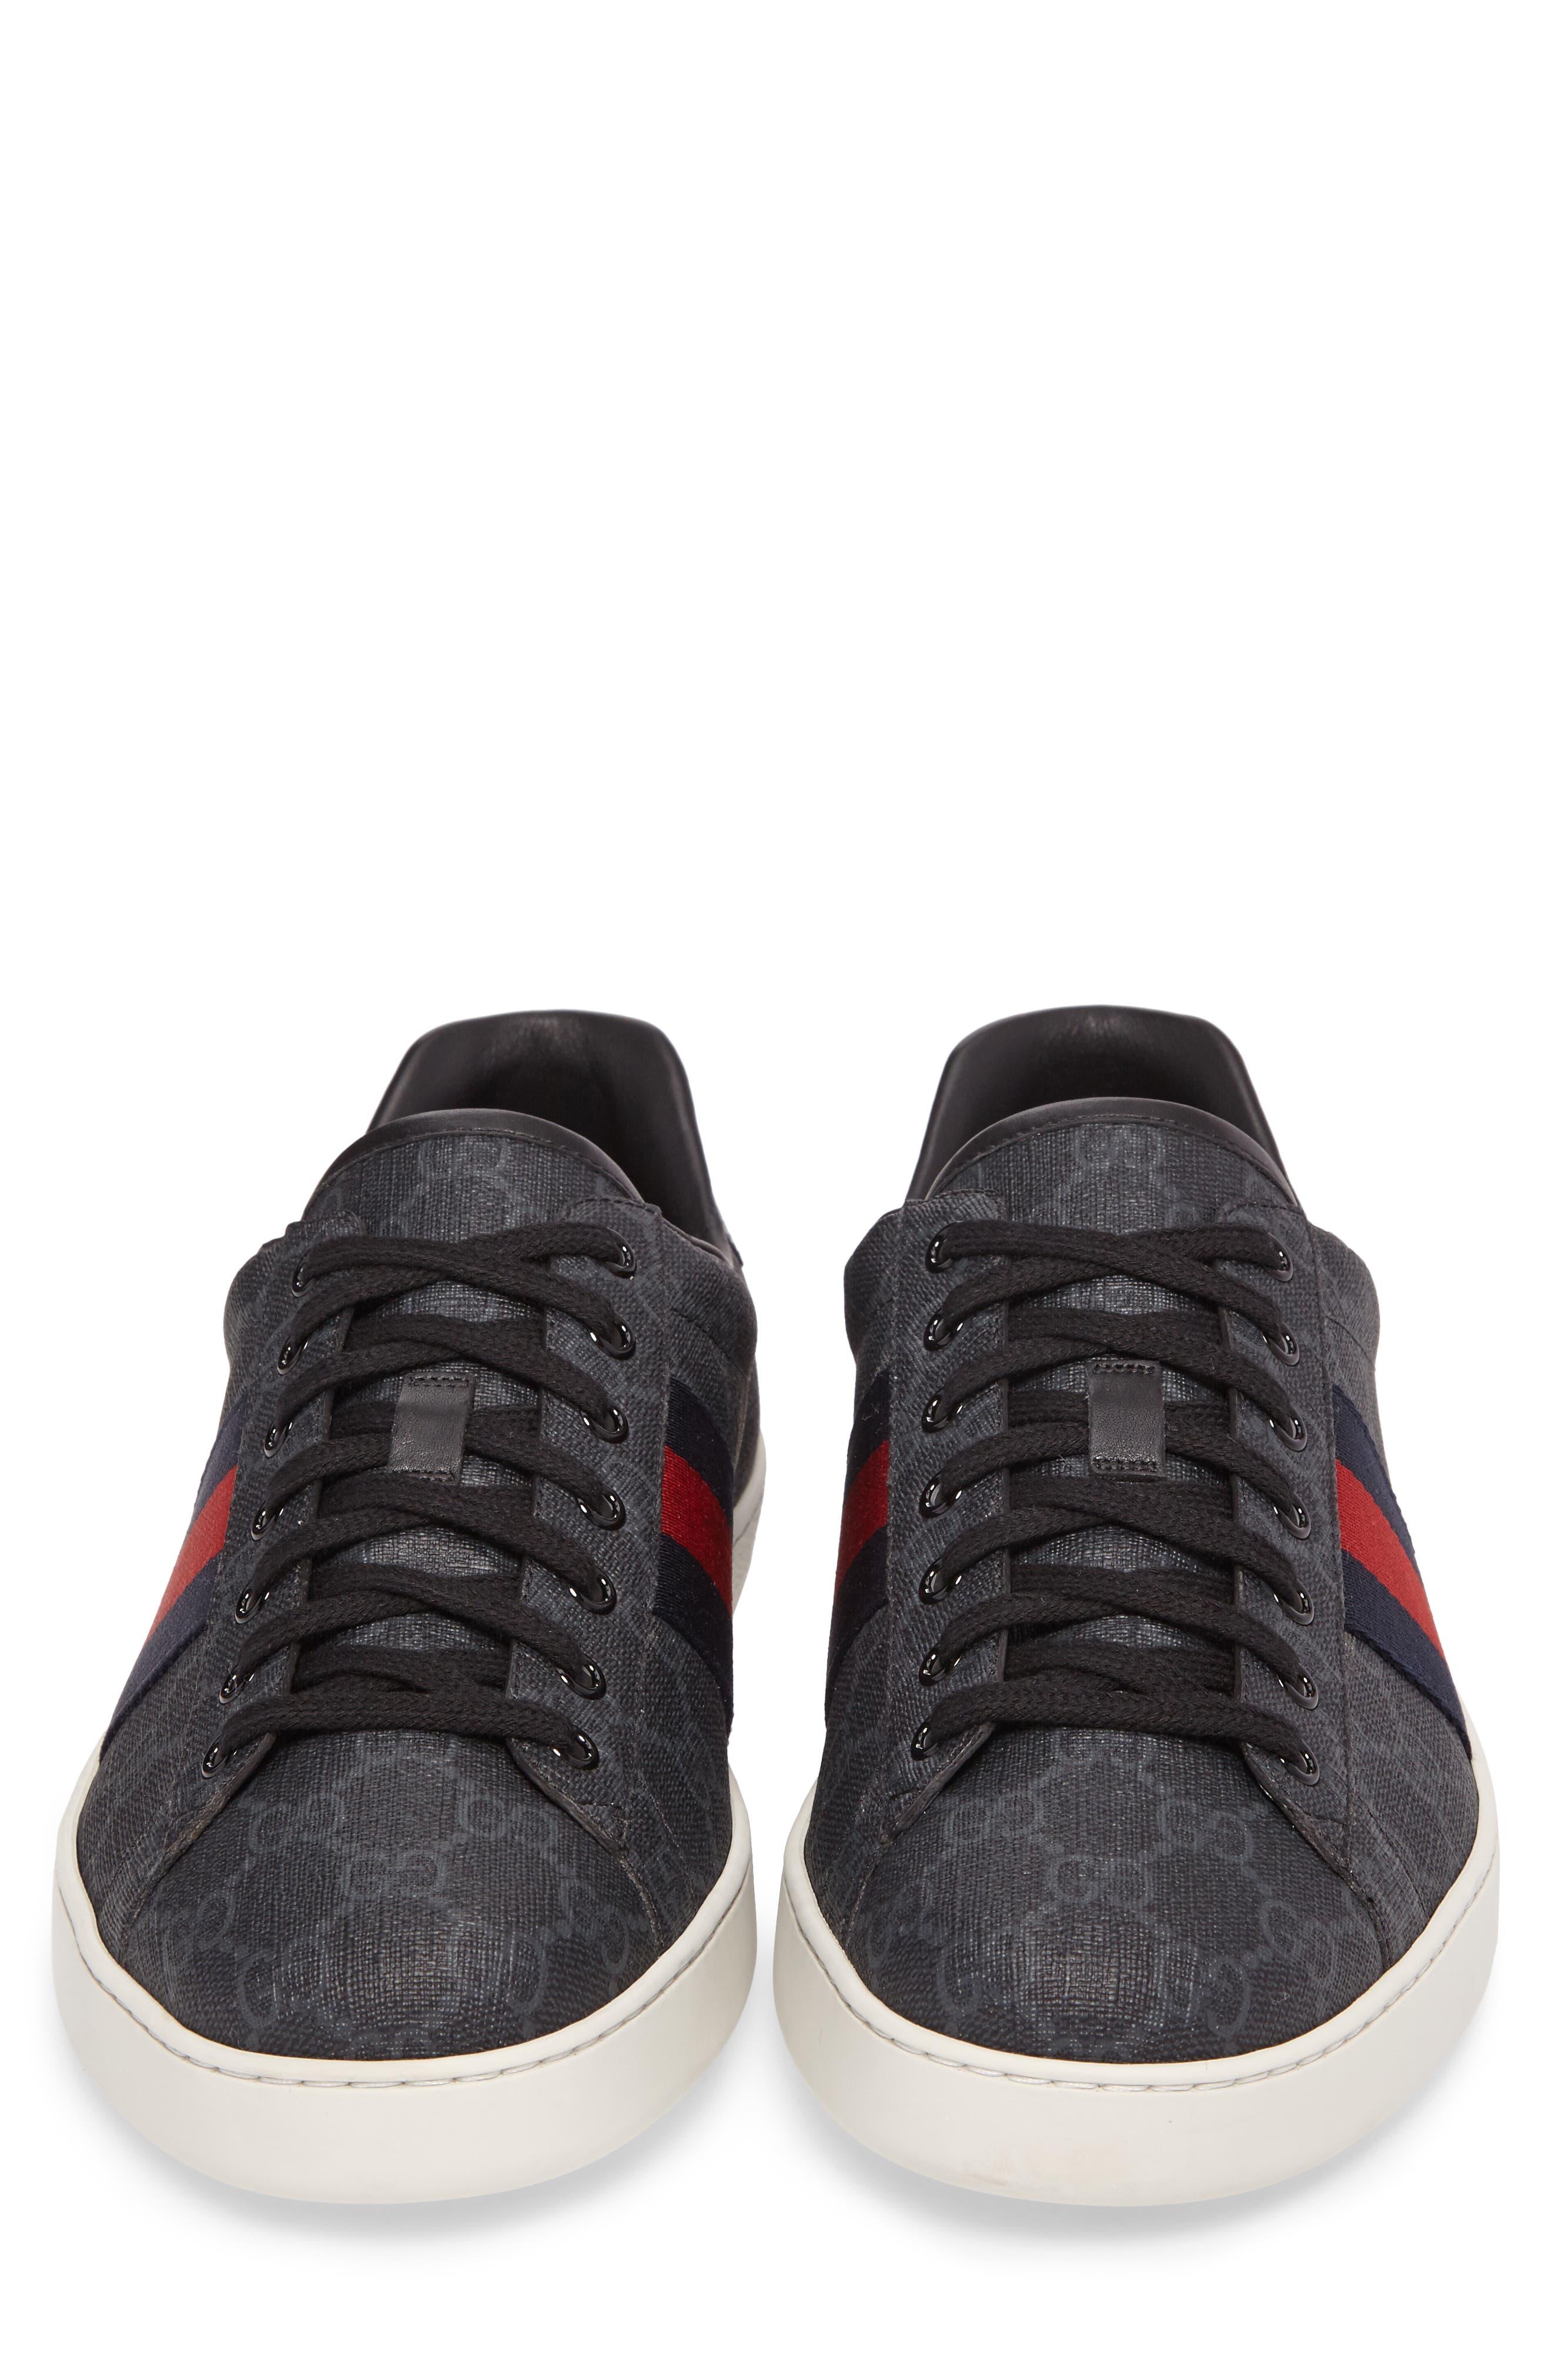 Alternate Image 4  - Gucci 'New Ace' Sneaker (Men)